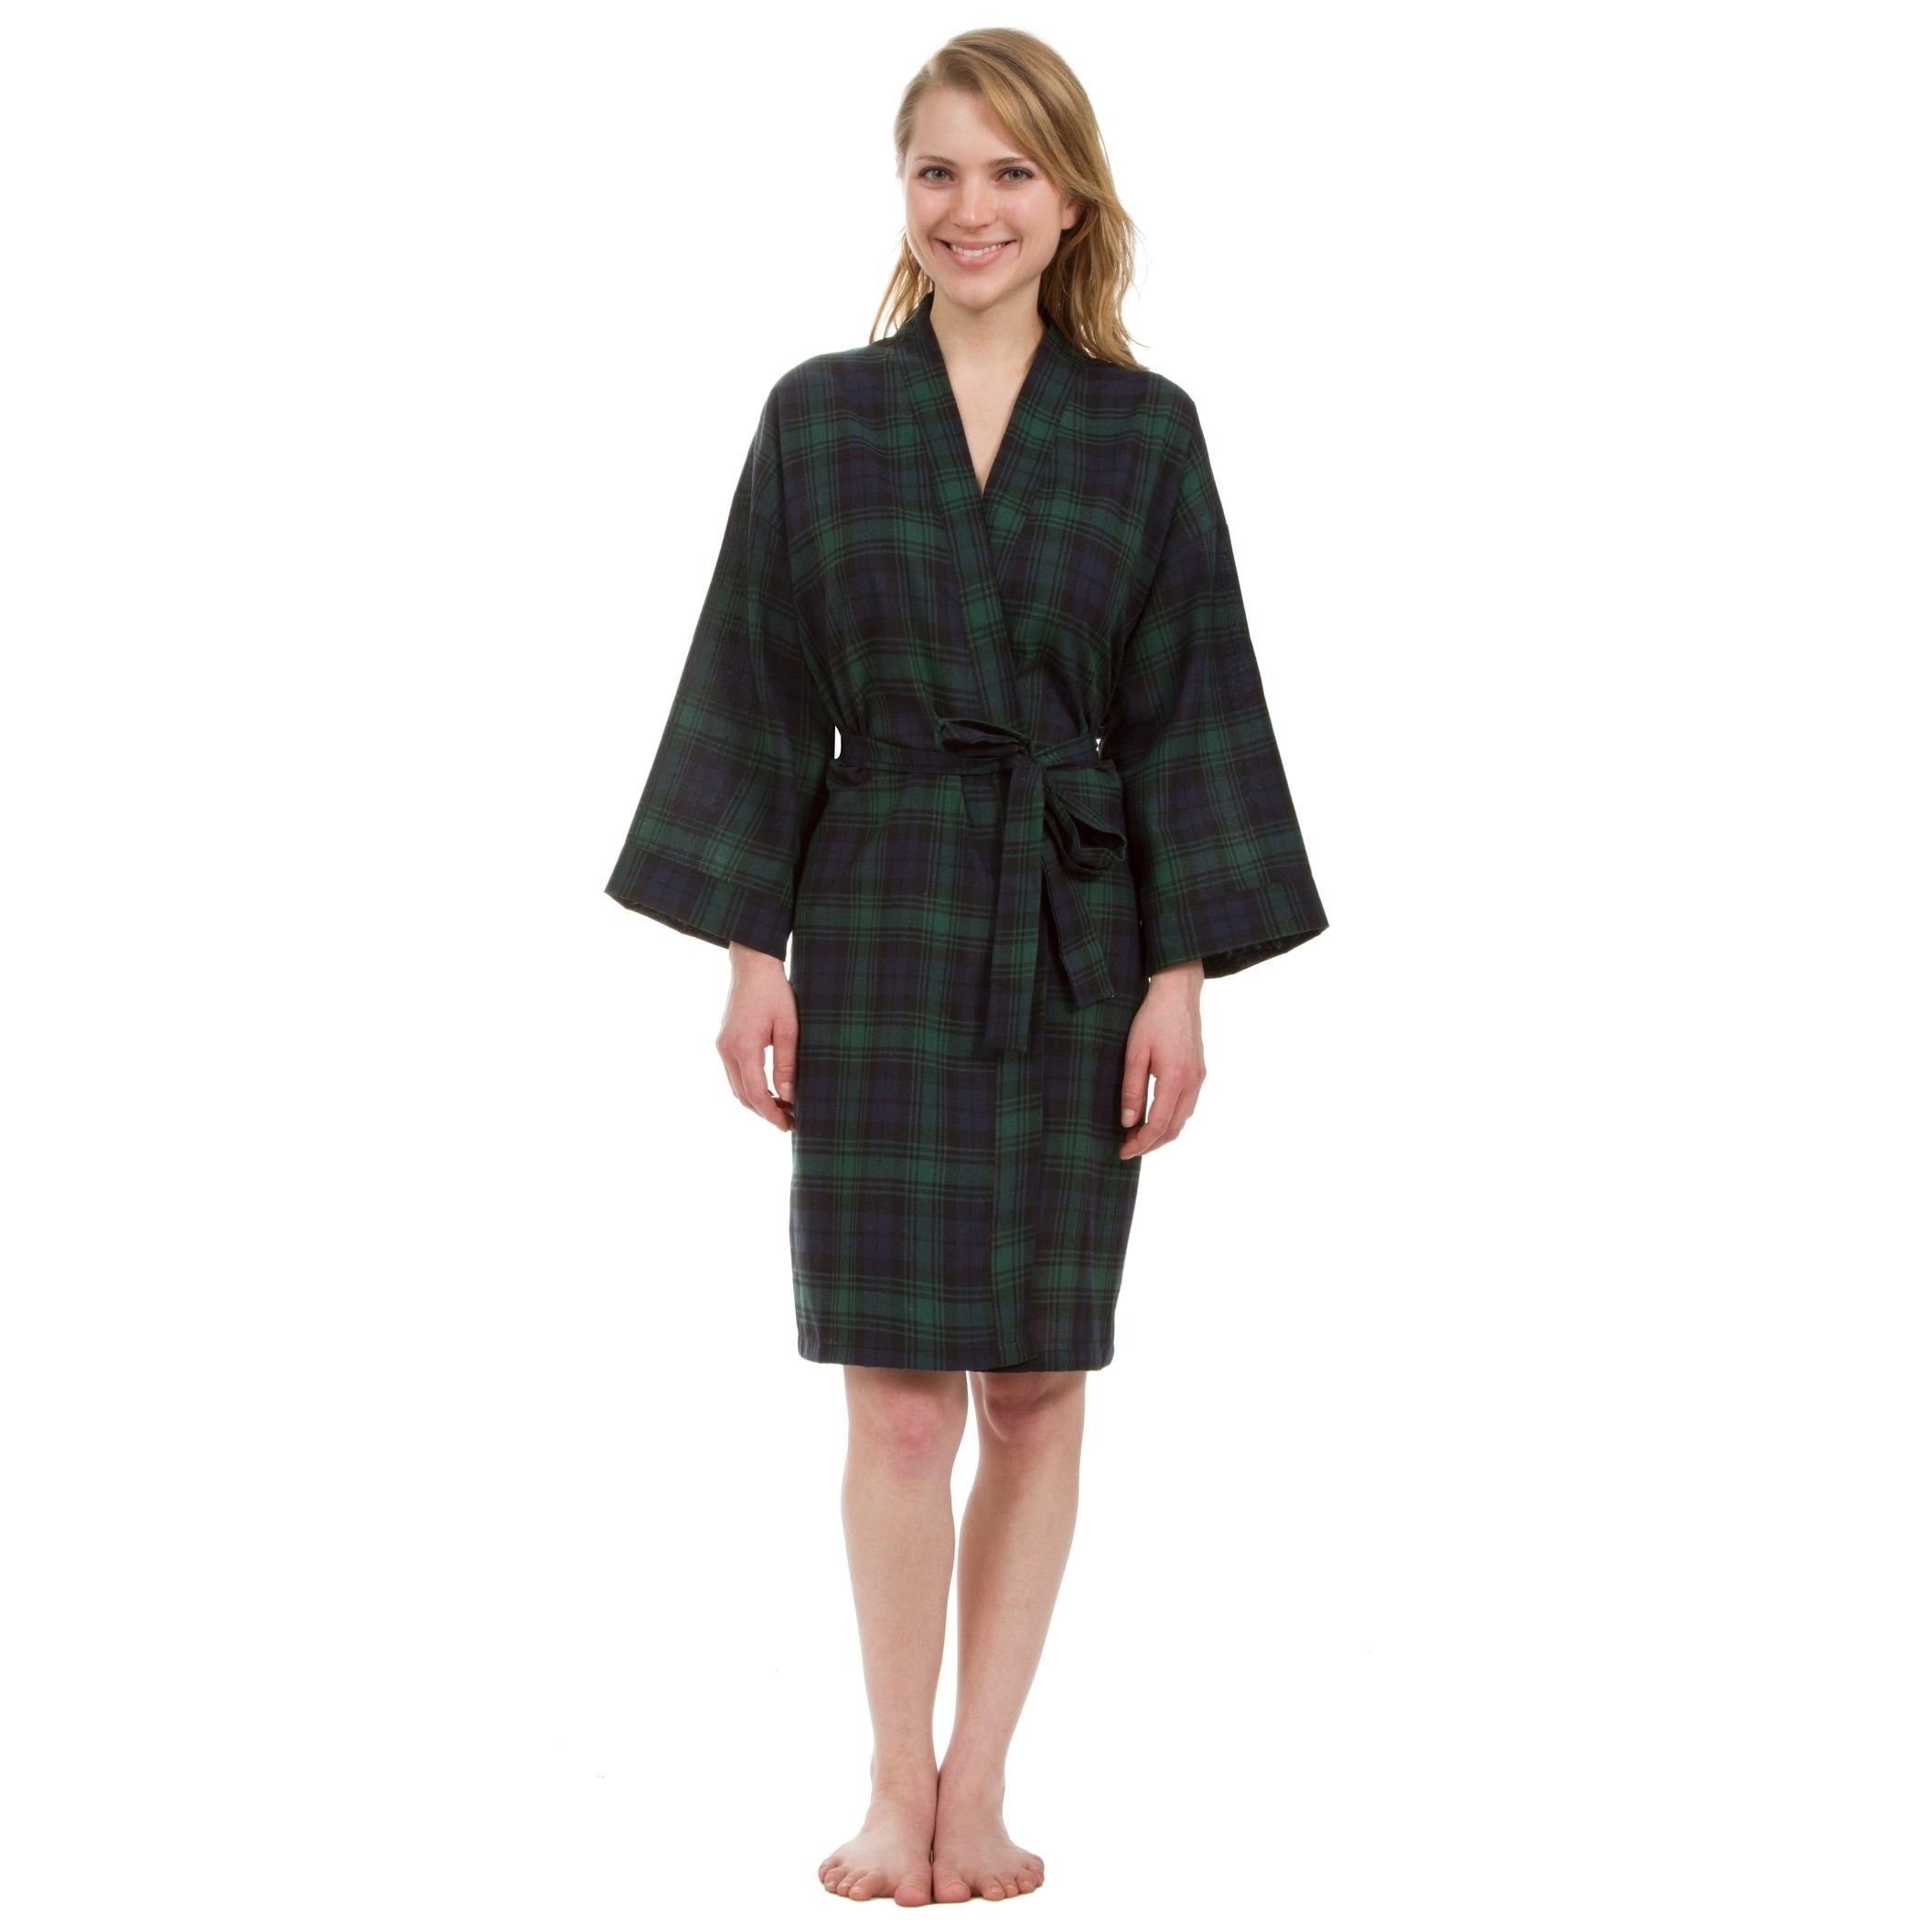 Women's Length Knee Leisureland Green Plaid Robe hrdCtxQsB